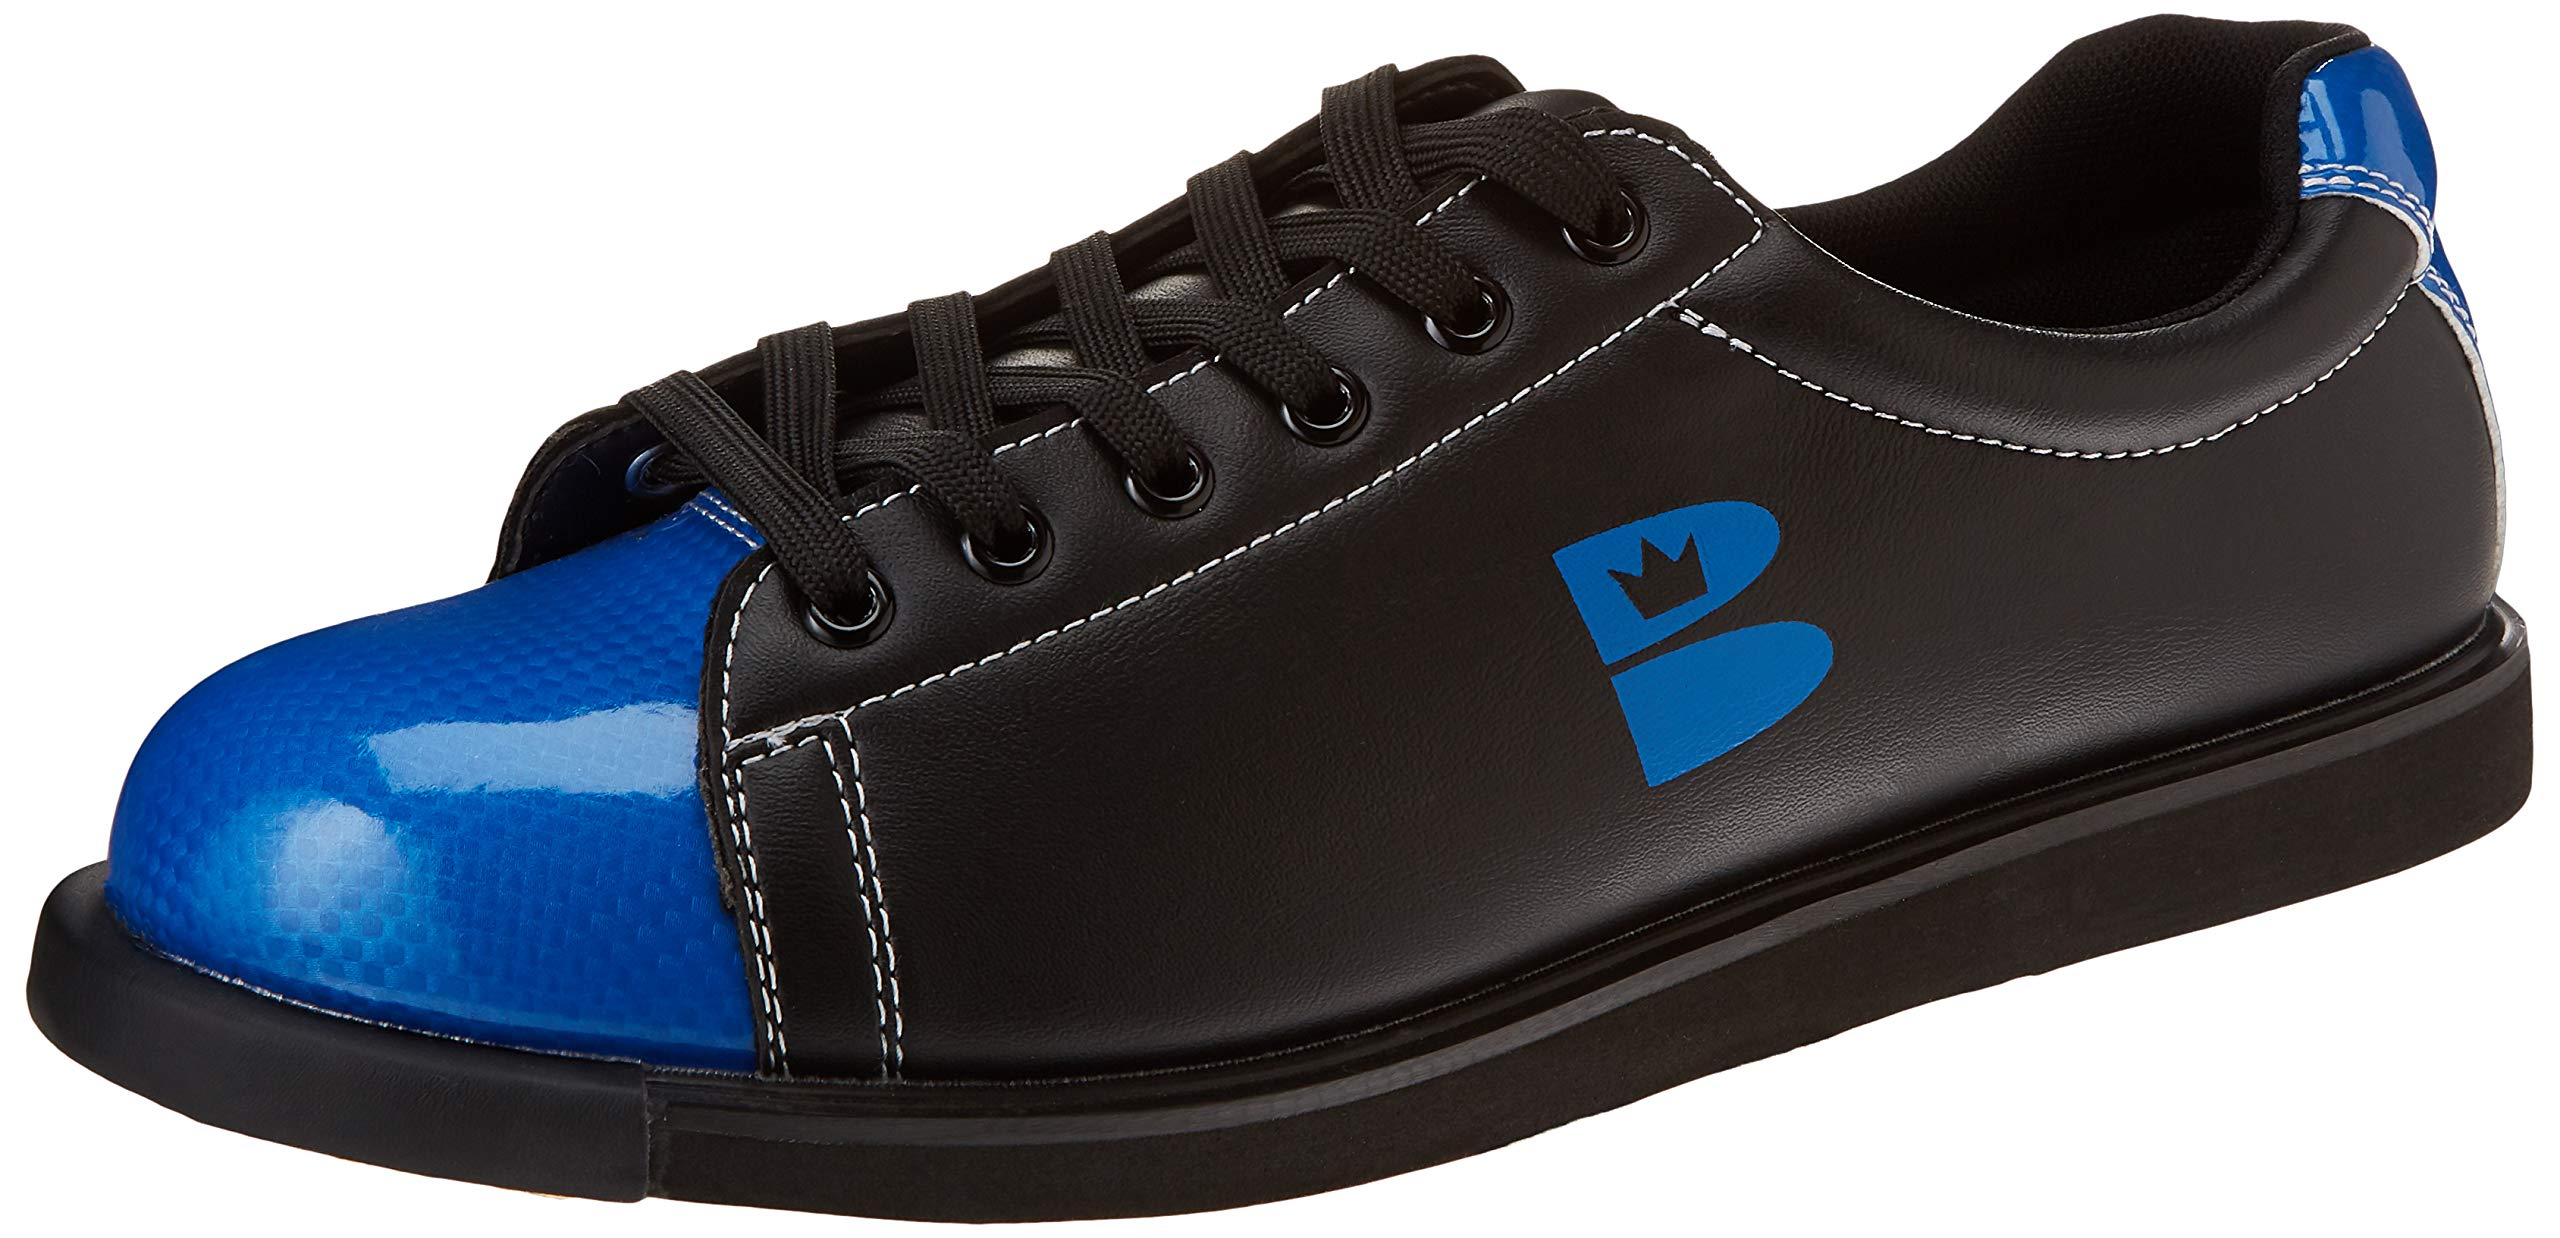 TZone Unisex Black/Blue Size 10/11.5 by Brunswick Bowling Products